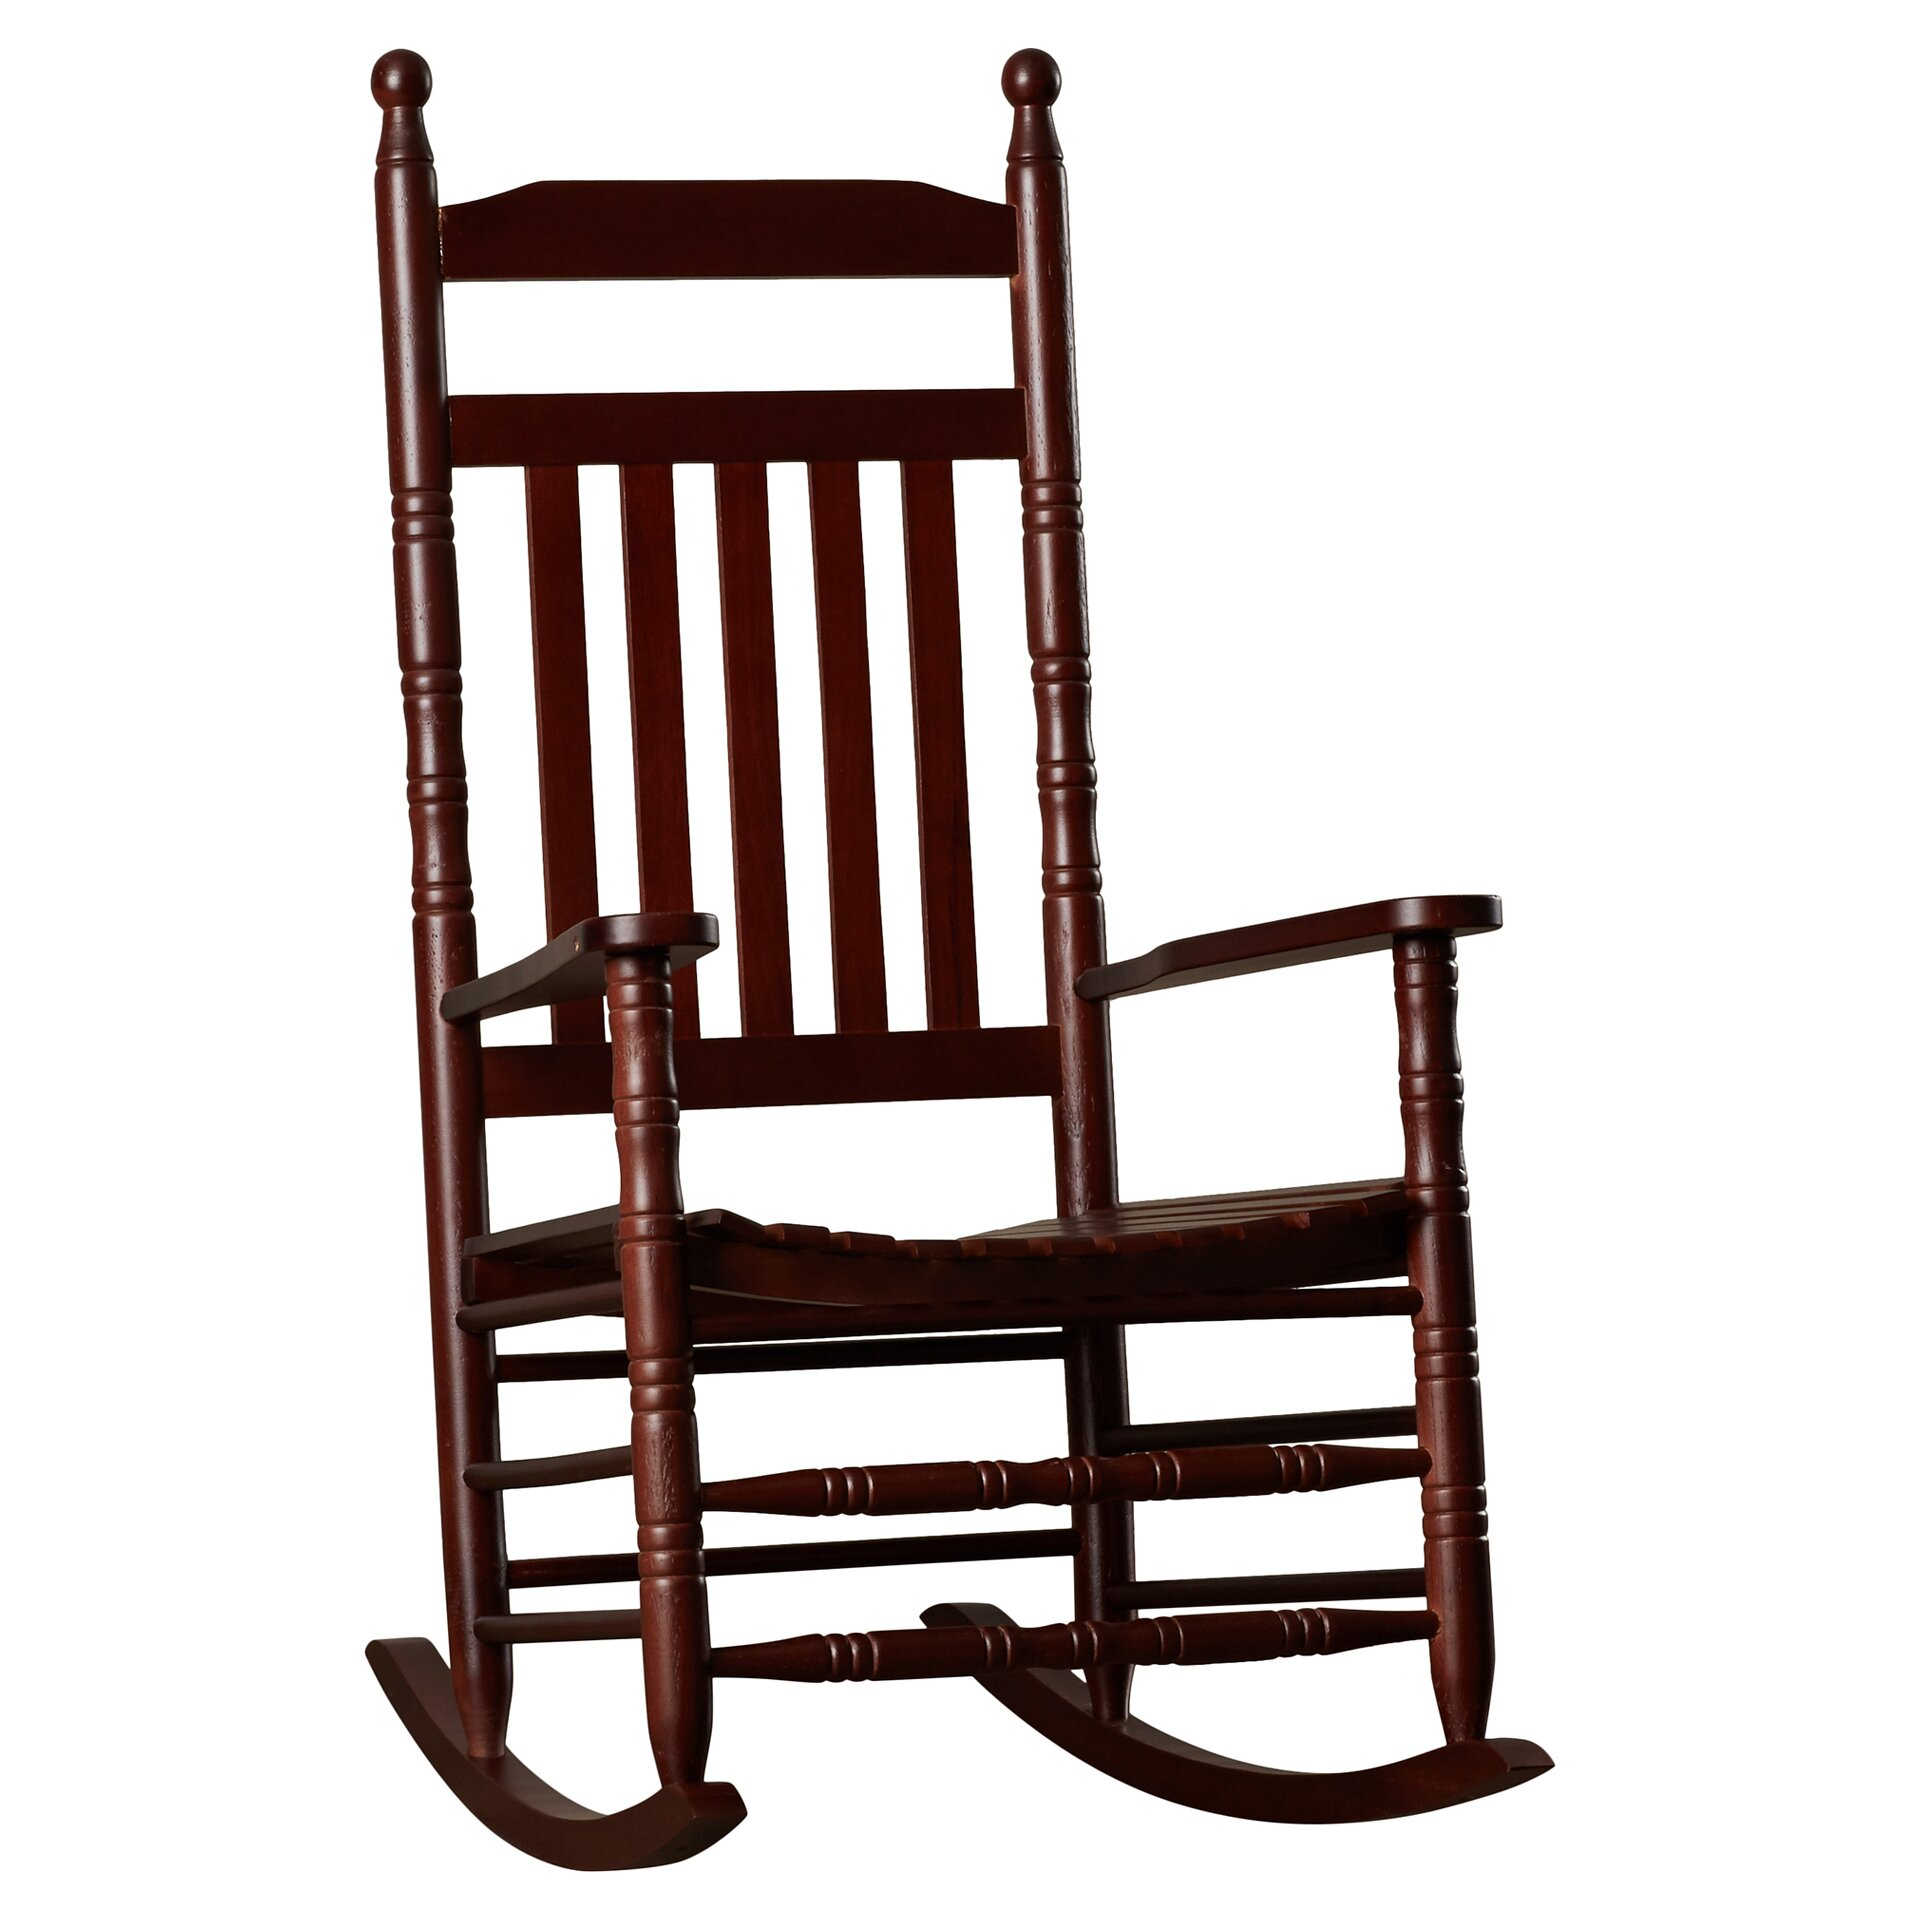 charlton home ballett adult rocking chair reviews